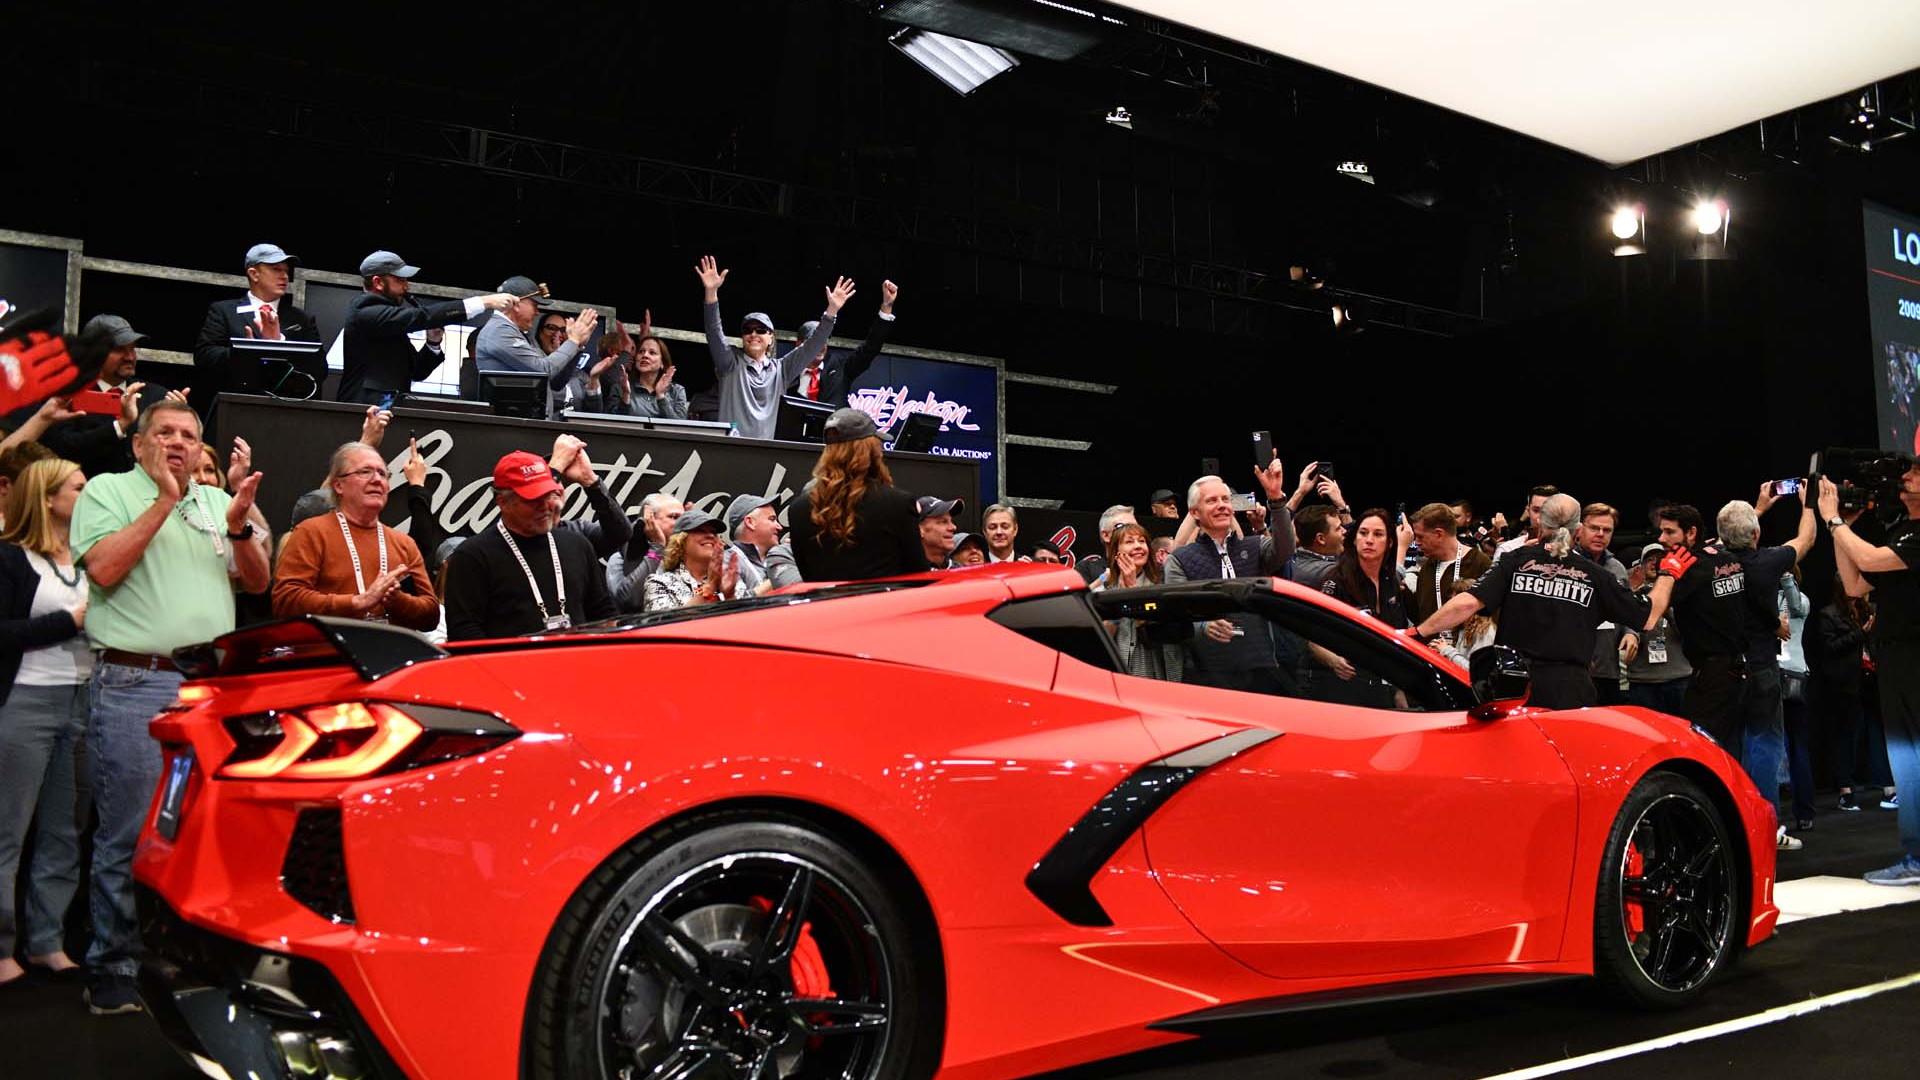 2020 Chevrolet Corvette C8 VIN 001 auctioned for charity